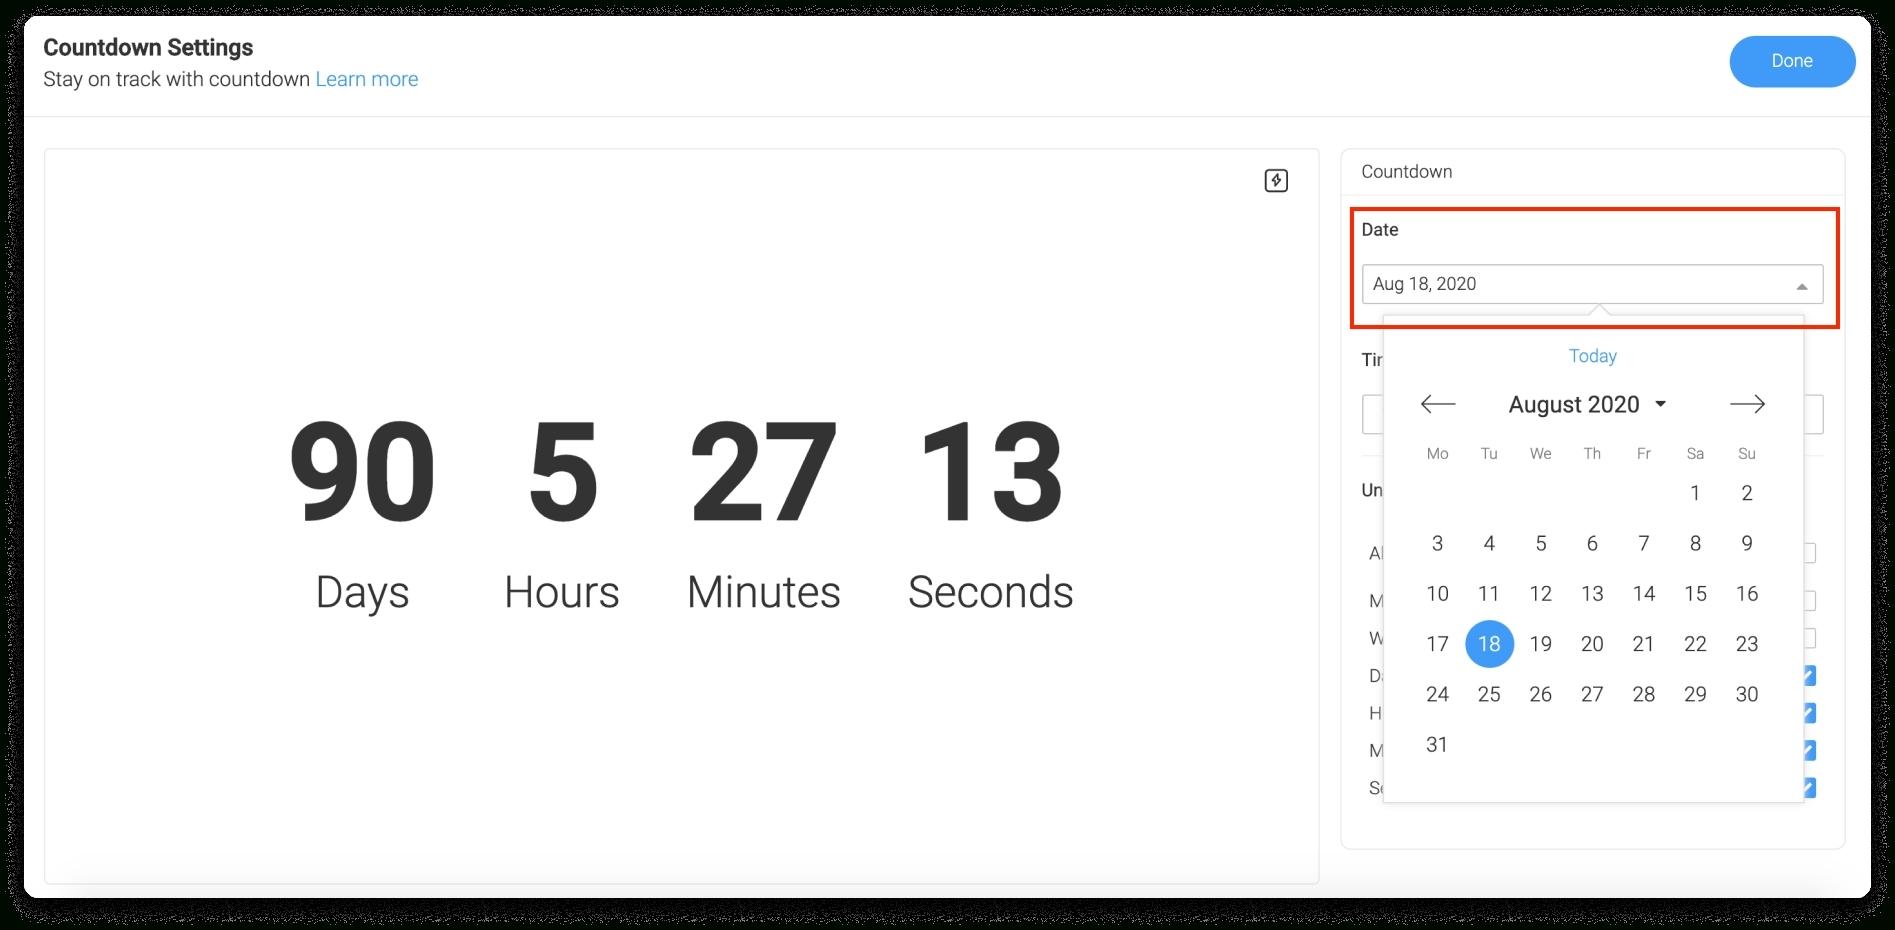 Windows 7 Countdown Calendar | Free Calendar Template Example for Retirement Countdown Calendar For Desktop